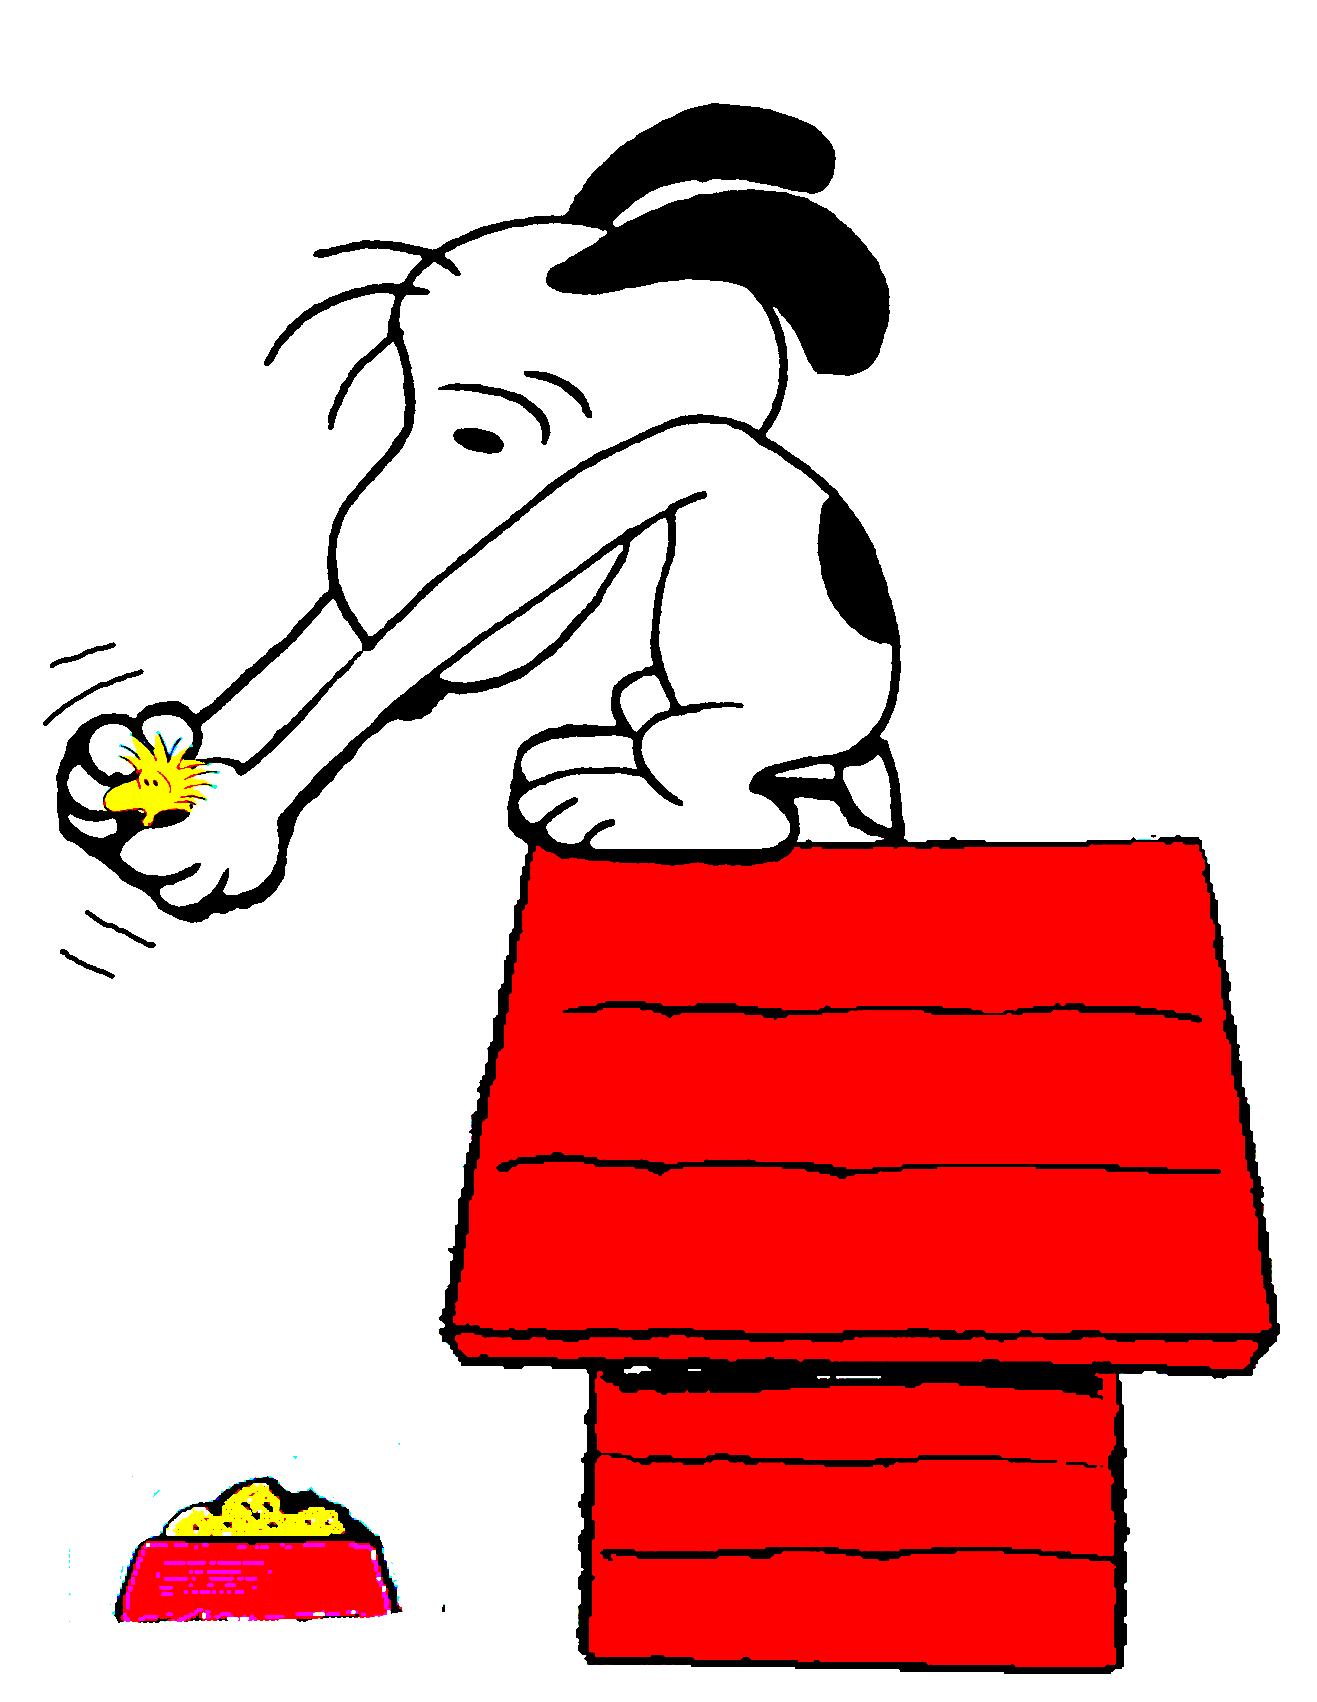 Winter clipart peanuts. Snoopy woodstock pinterest charlie